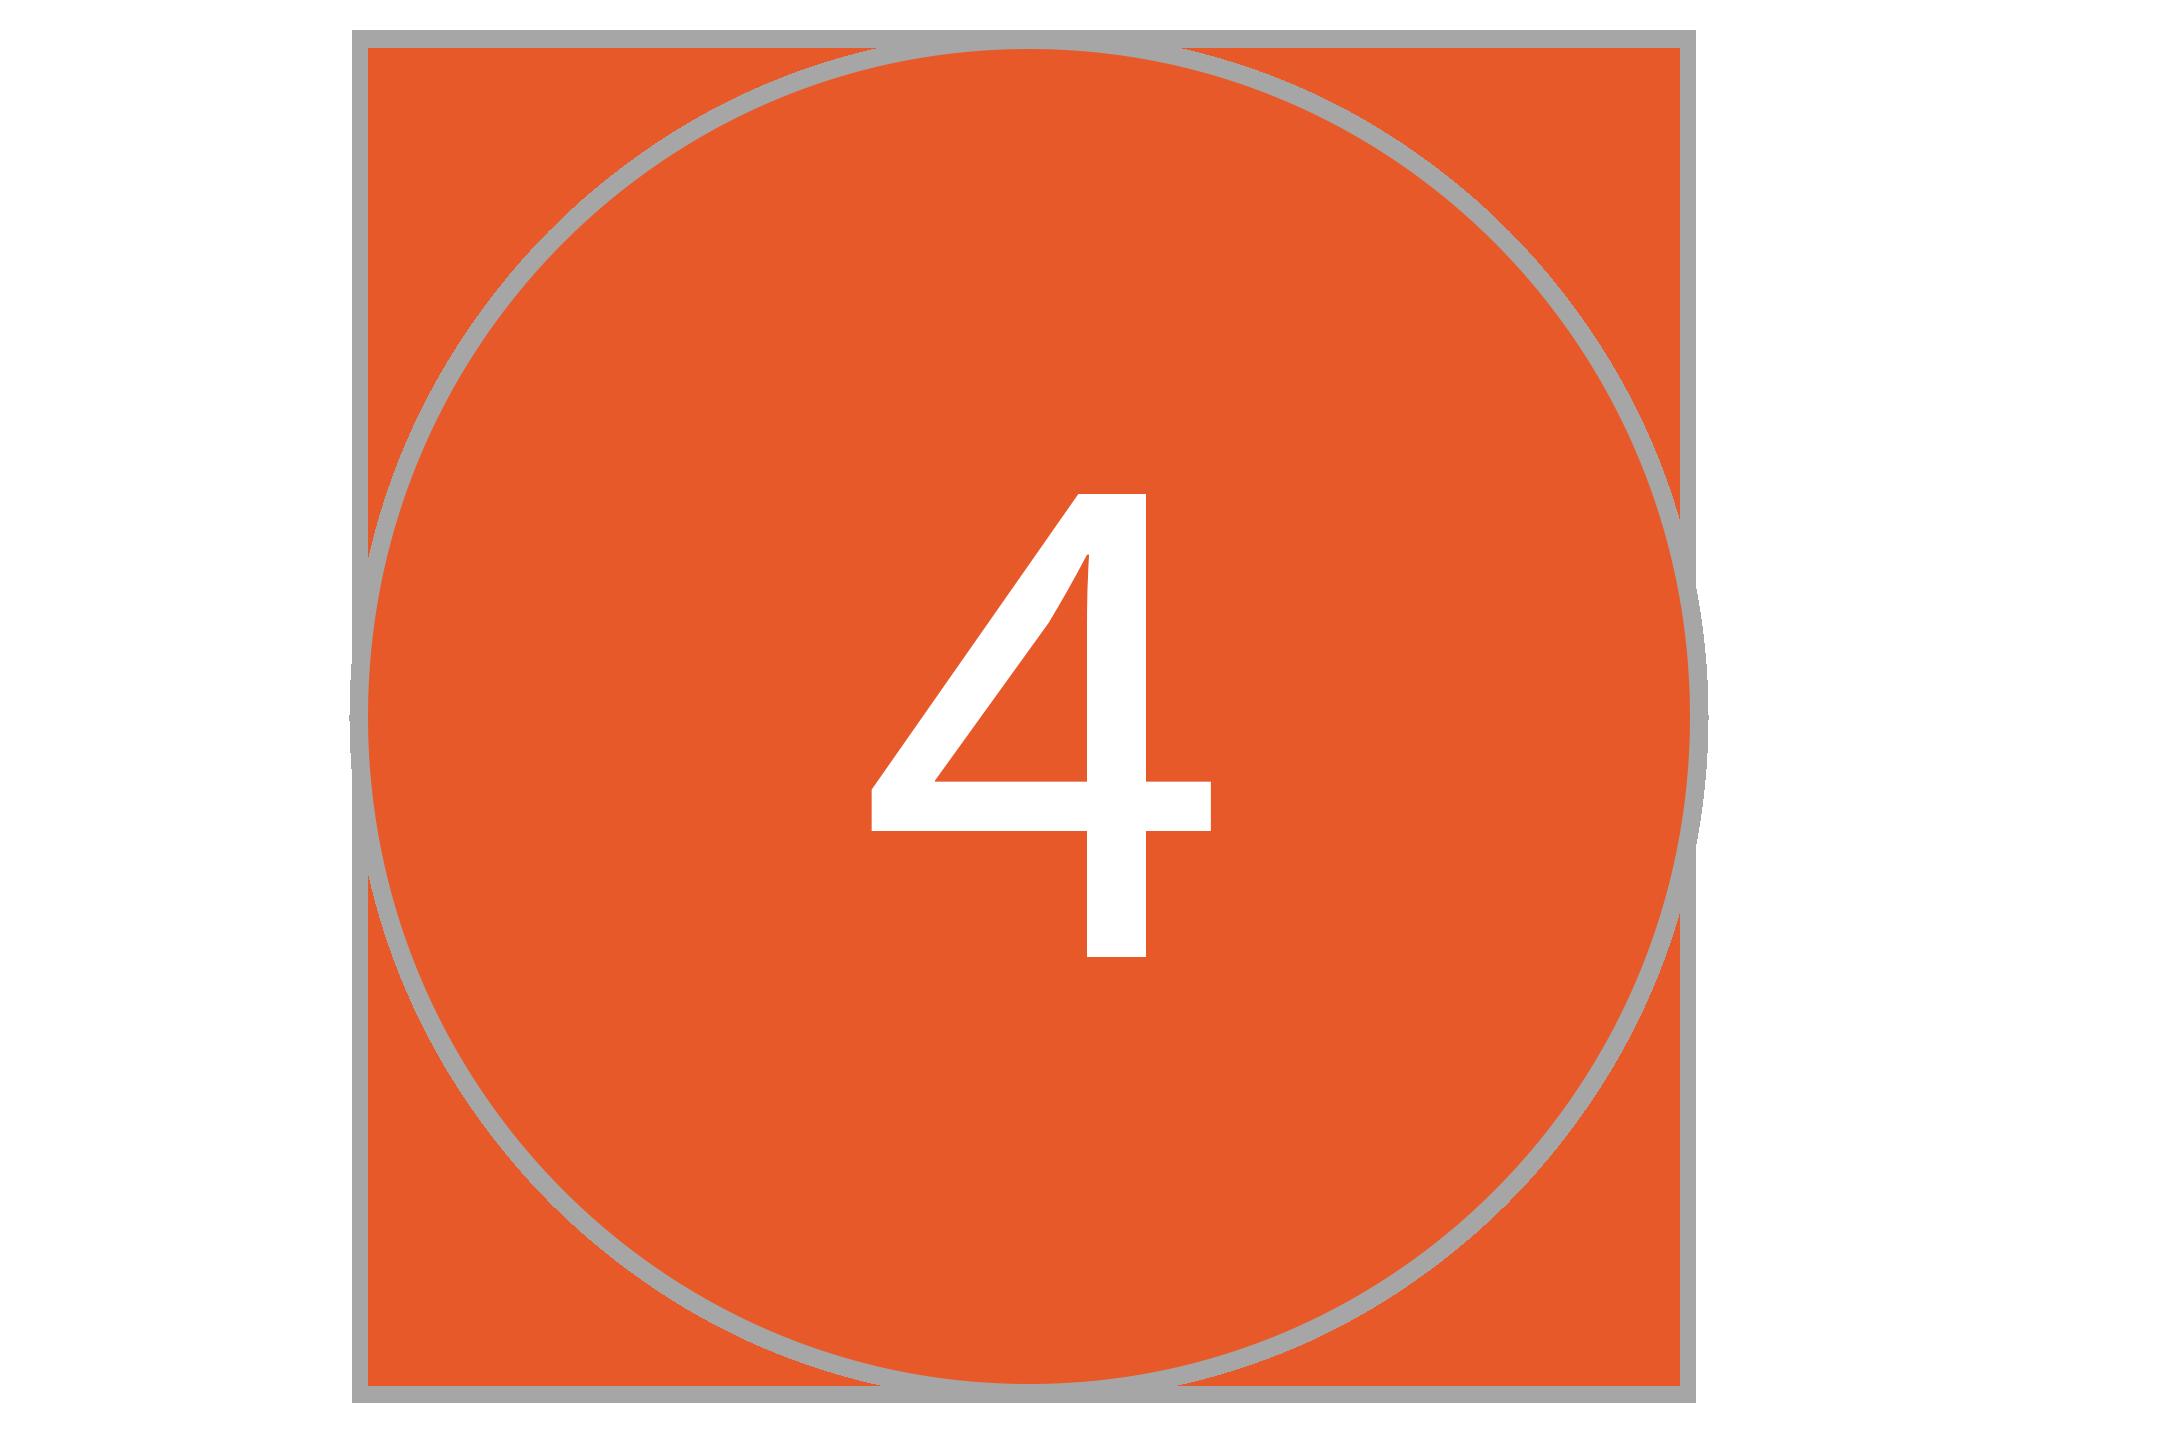 cirkel 4